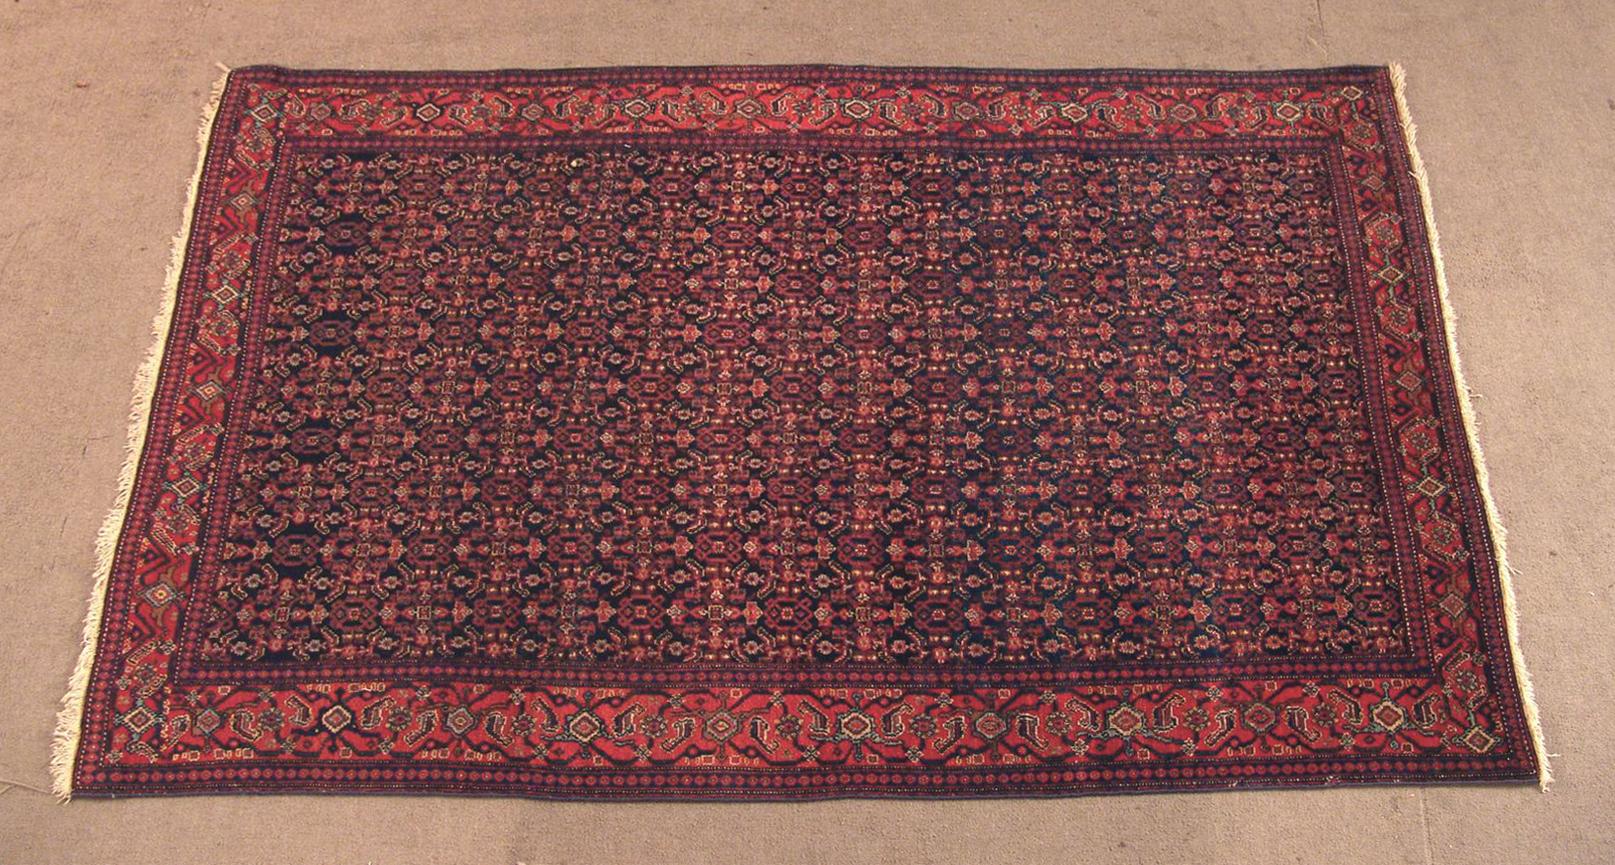 Bgw remate 205 alfombra gek htm gendata for Alfombra persa azul